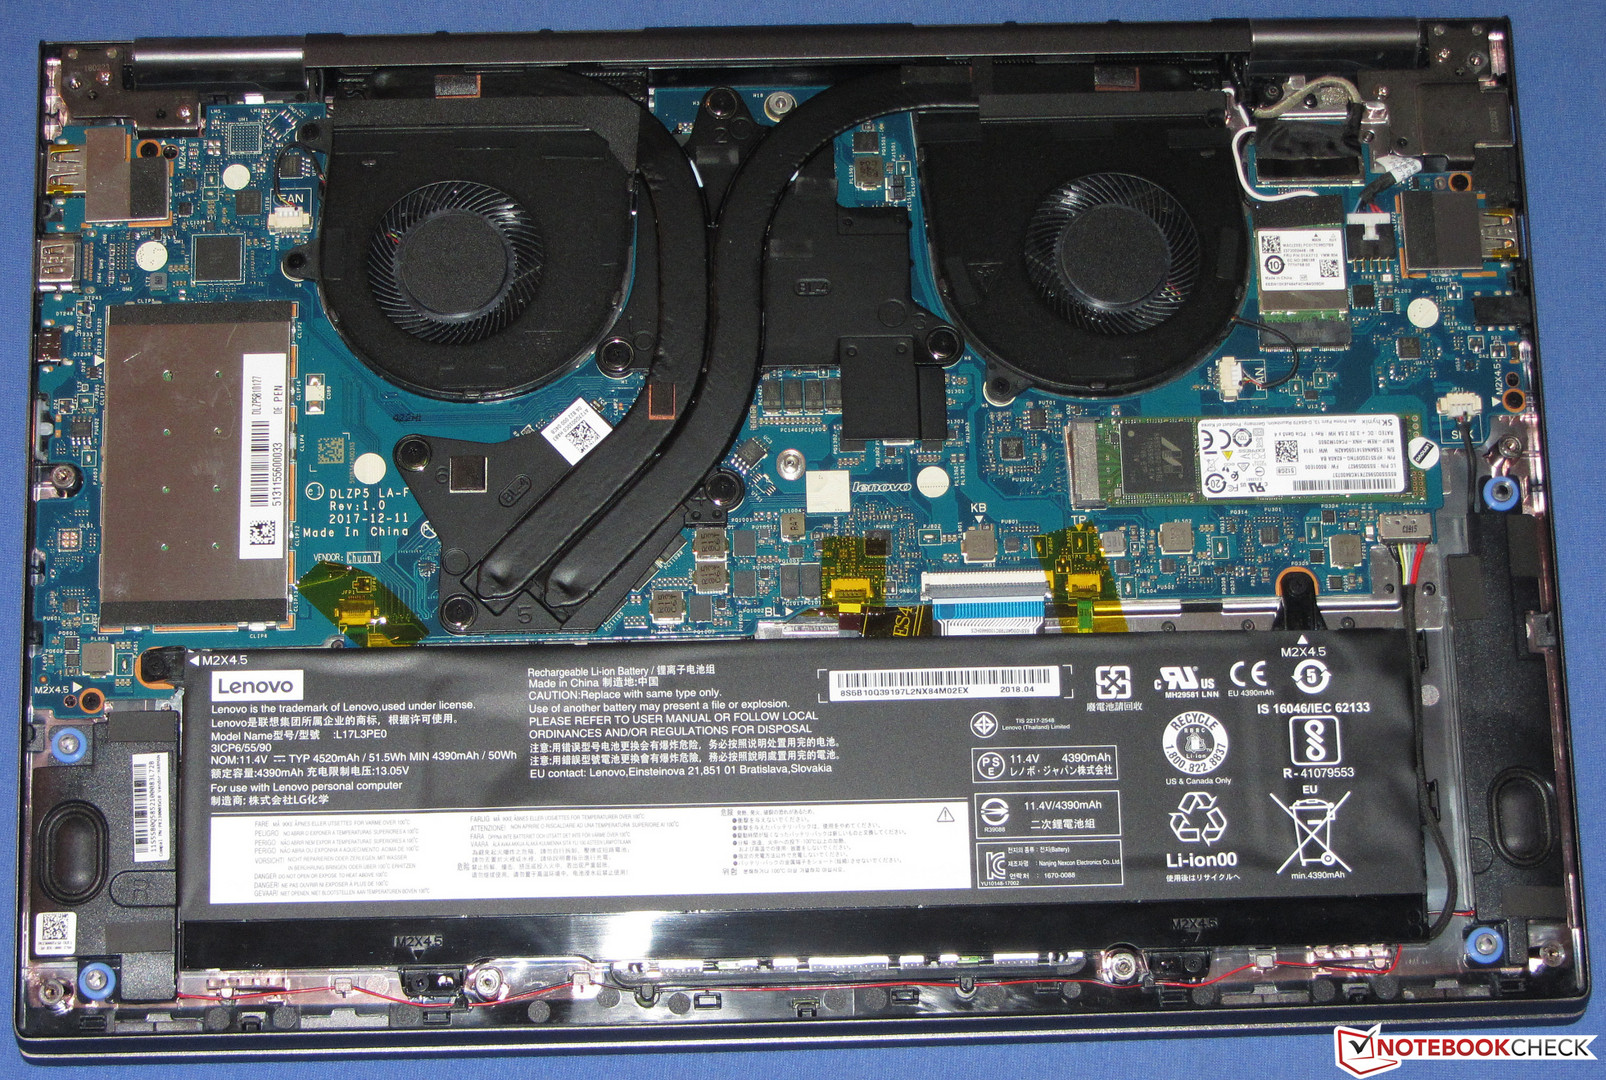 Lenovo Yoga 730-15IKB (i7-8550U, GTX 1050, SSD, 4K